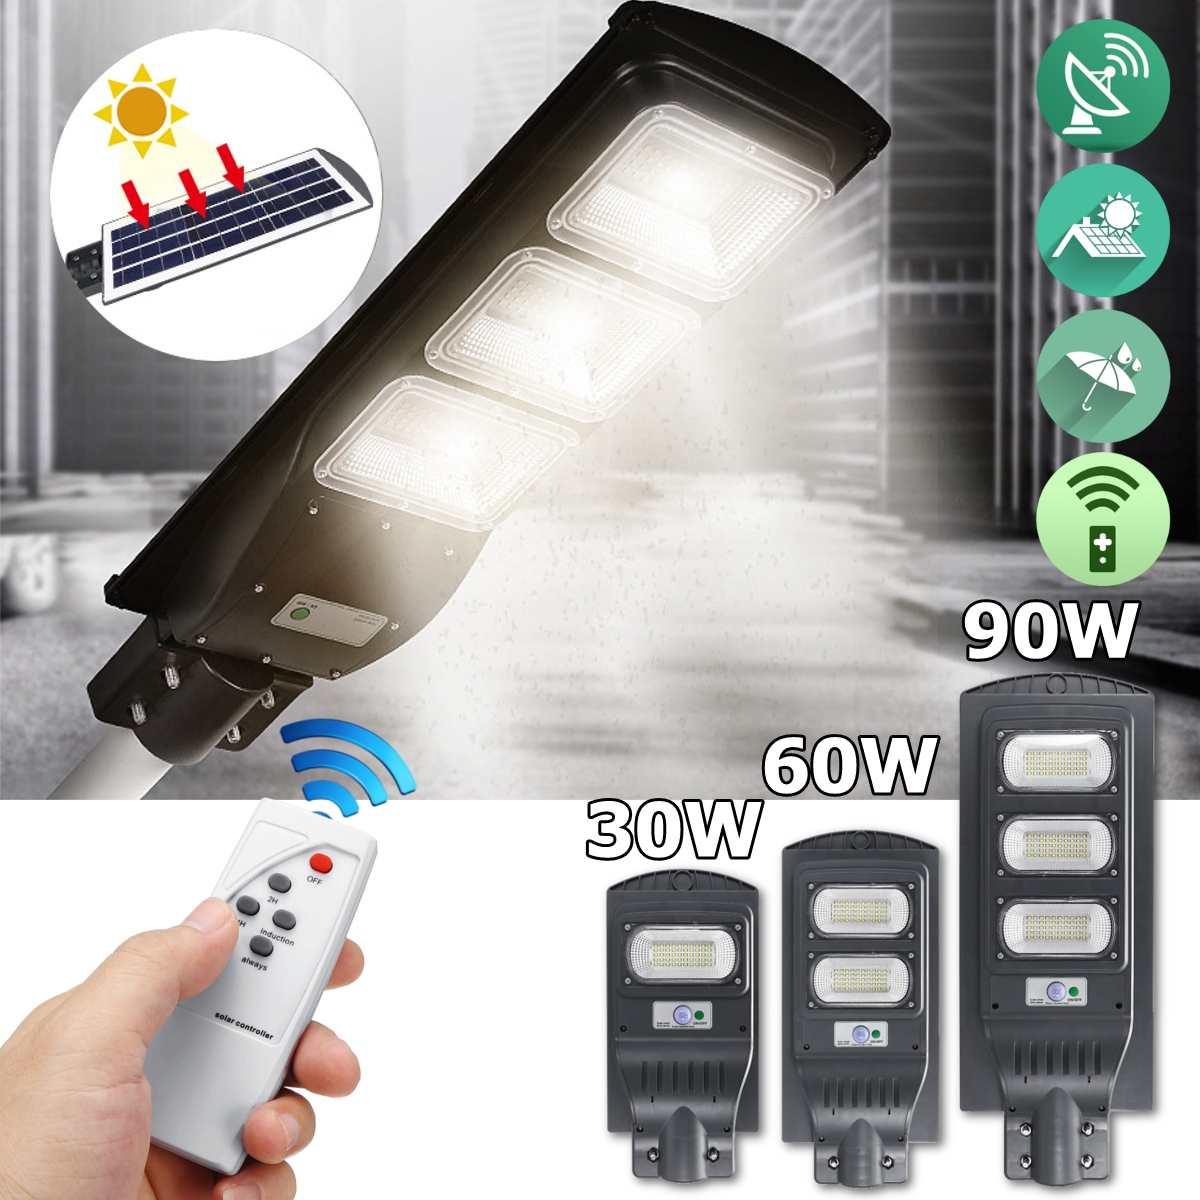 LED Street Light 30/60/100W LED Solar Light Radar PIR Motion Sensor Wall Timing Lamp+Remote Waterproof For Plaza Garden Yard